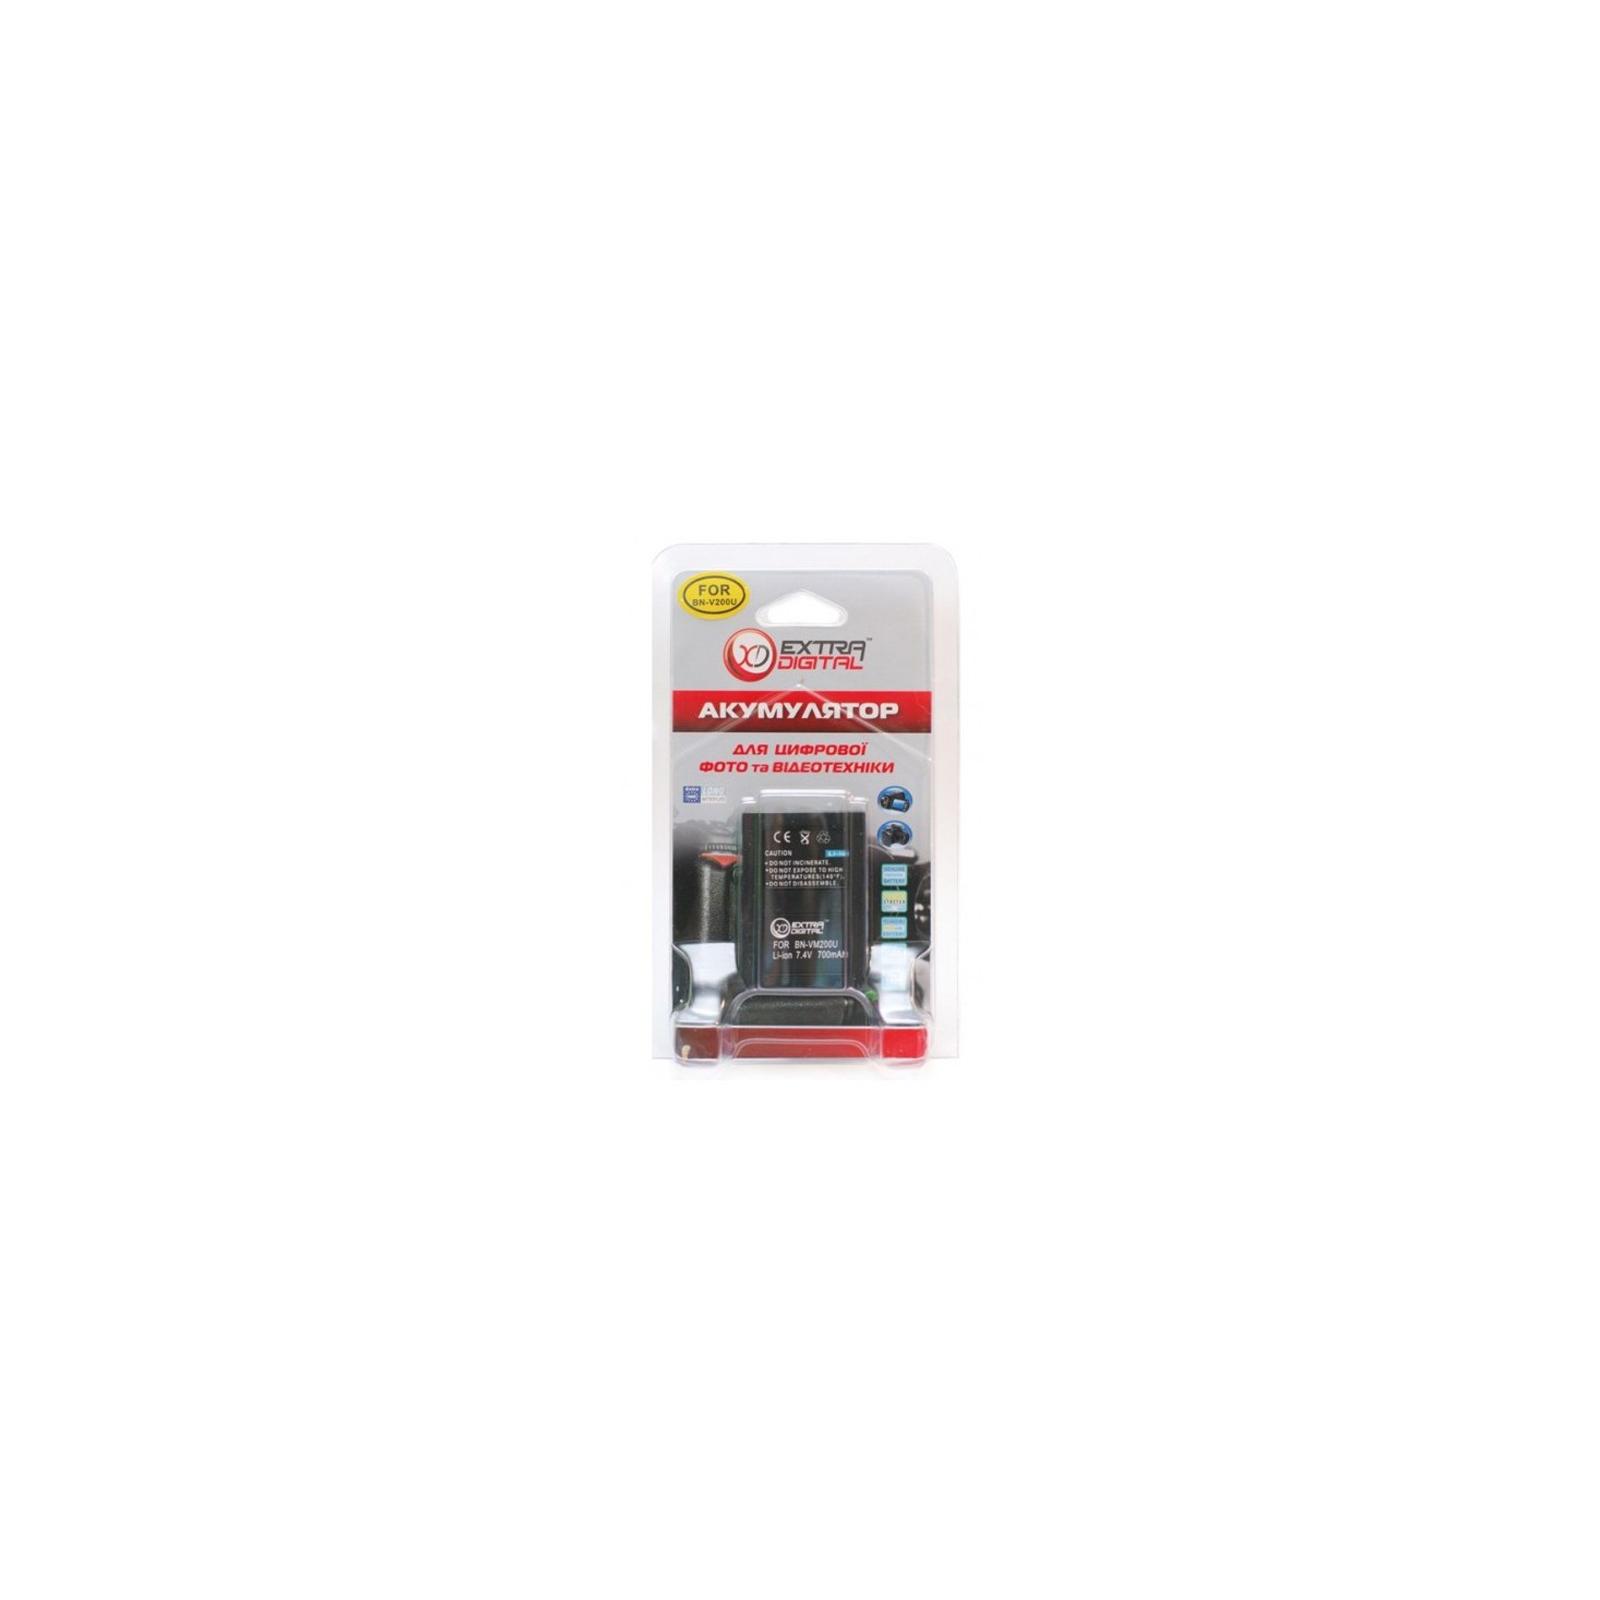 Аккумулятор к фото/видео EXTRADIGITAL JVC BN-VM200U (DV00DV1327) изображение 3